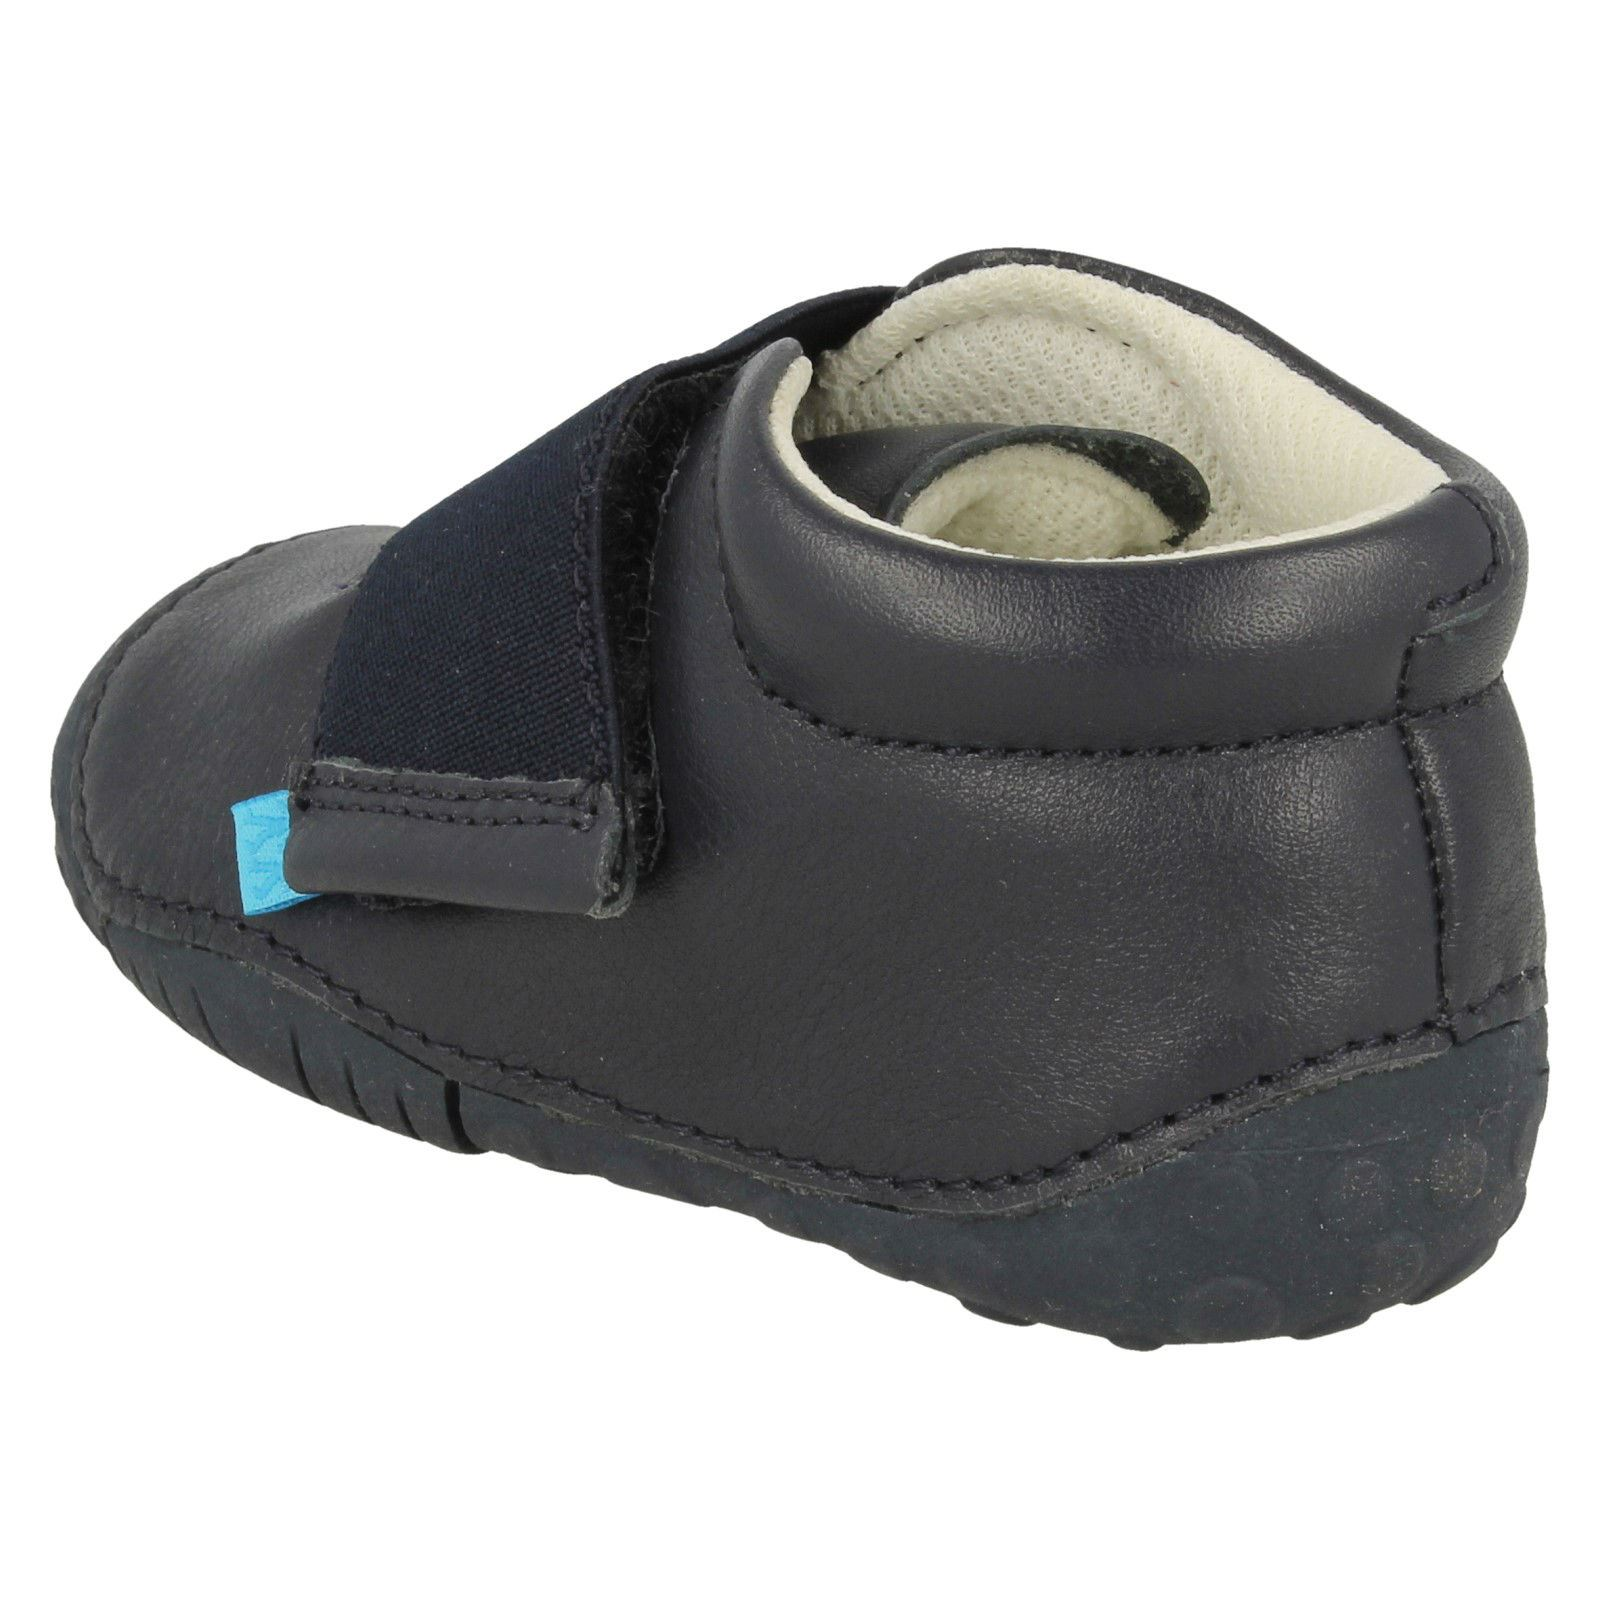 Startrite Pre Boys walkers azul Calzado Casual dPOqOwY